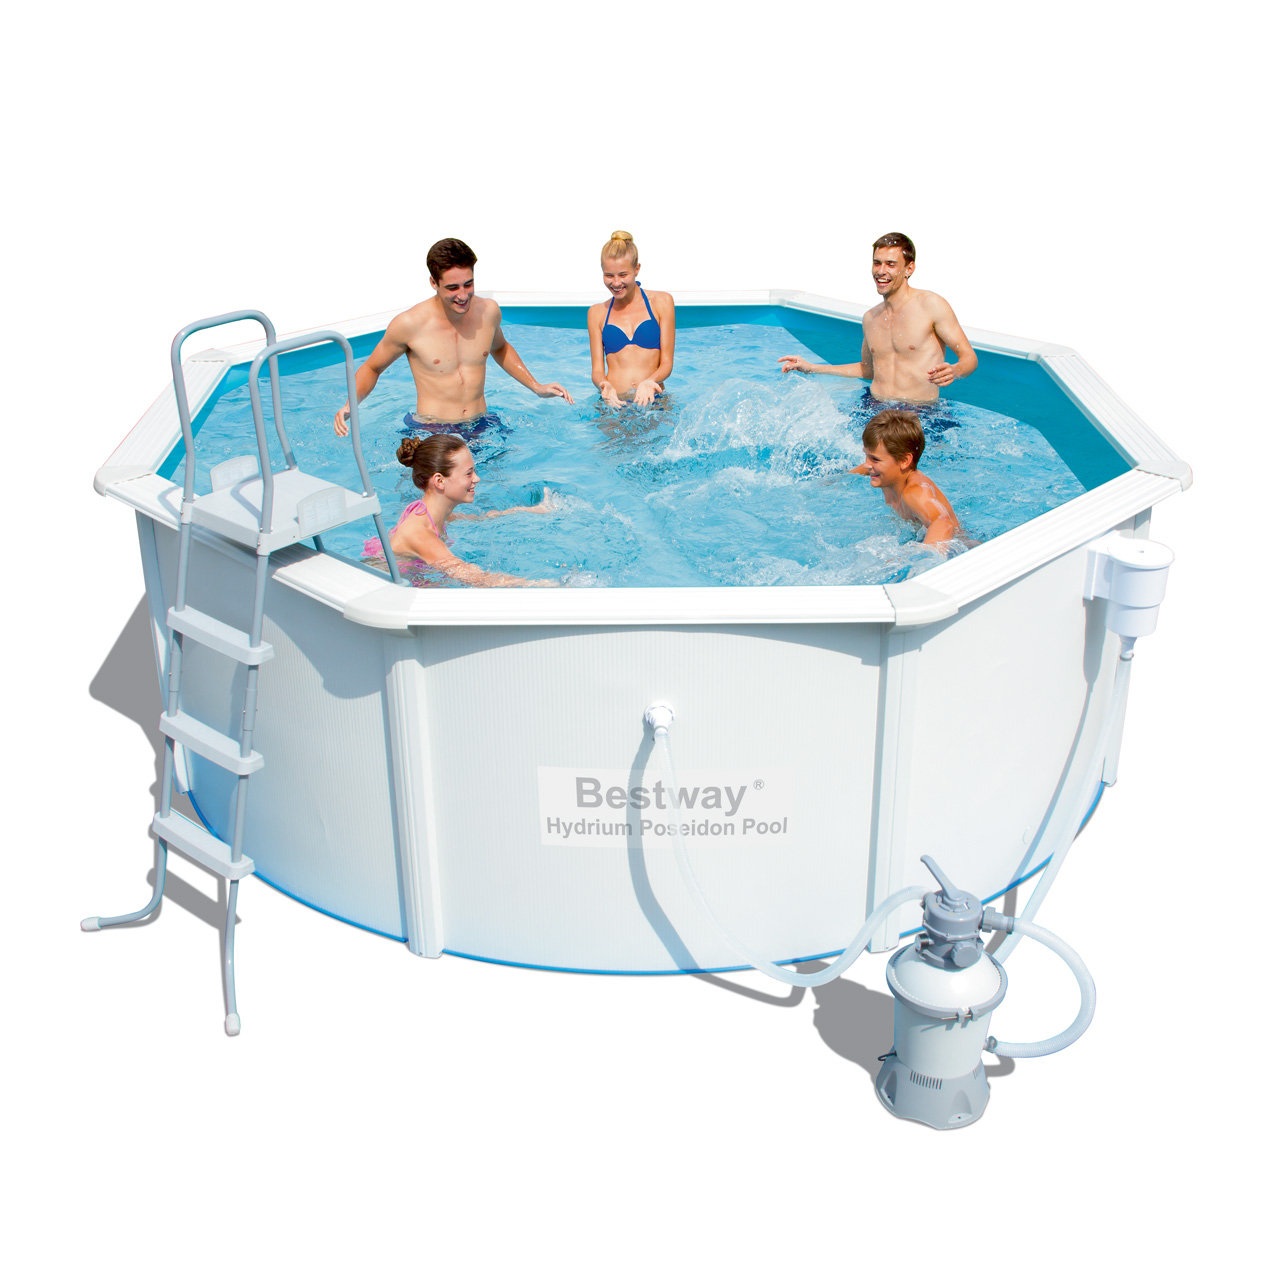 bestway hydrium neptune pool 366x122cm m sandfilter pumpe udg et. Black Bedroom Furniture Sets. Home Design Ideas